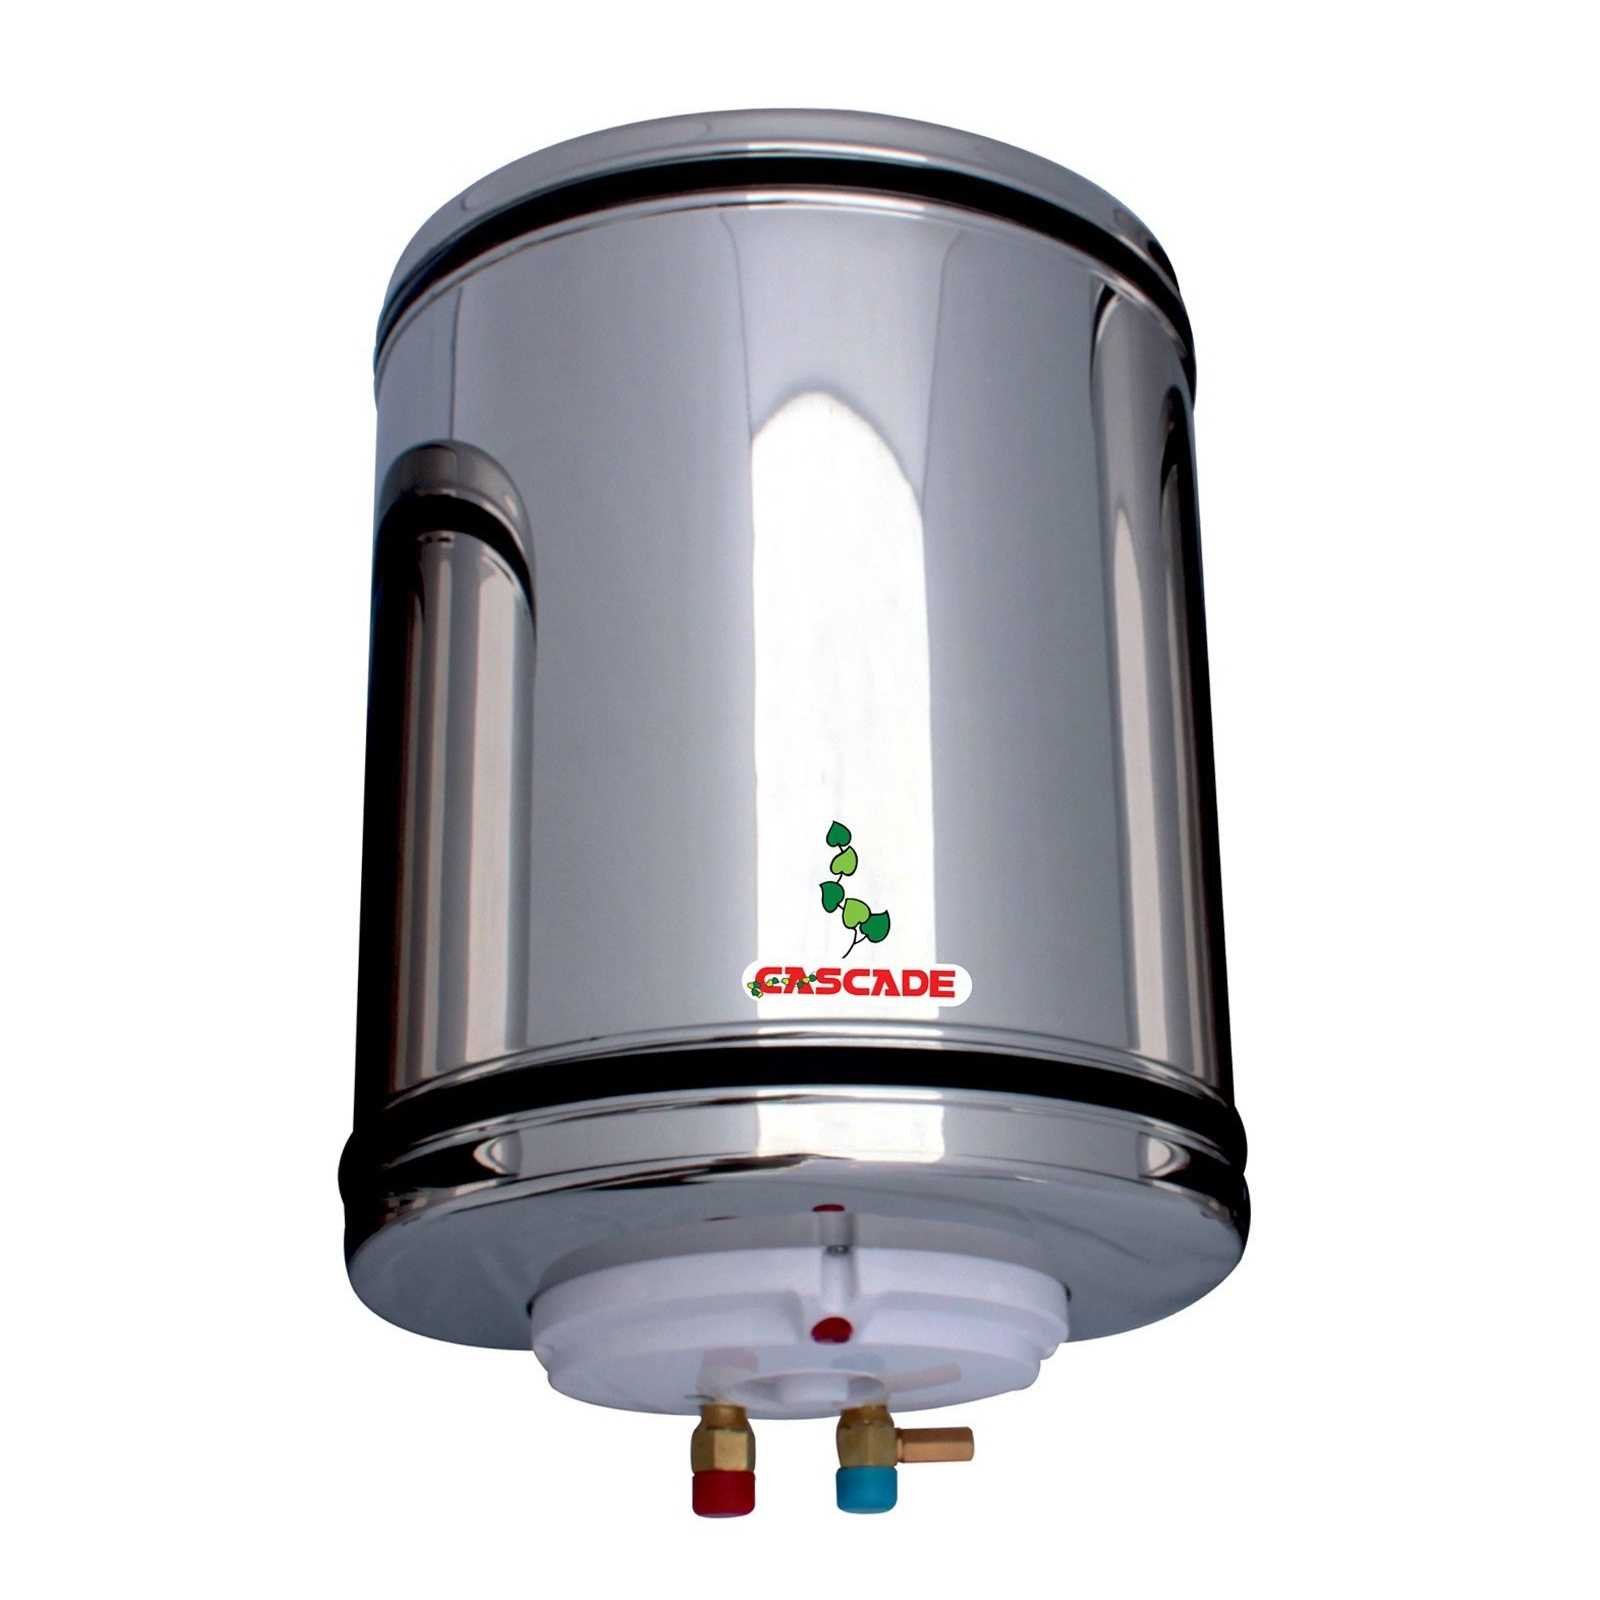 Cascade Tuffy Max Surge 25 Litre Storage Water Heater